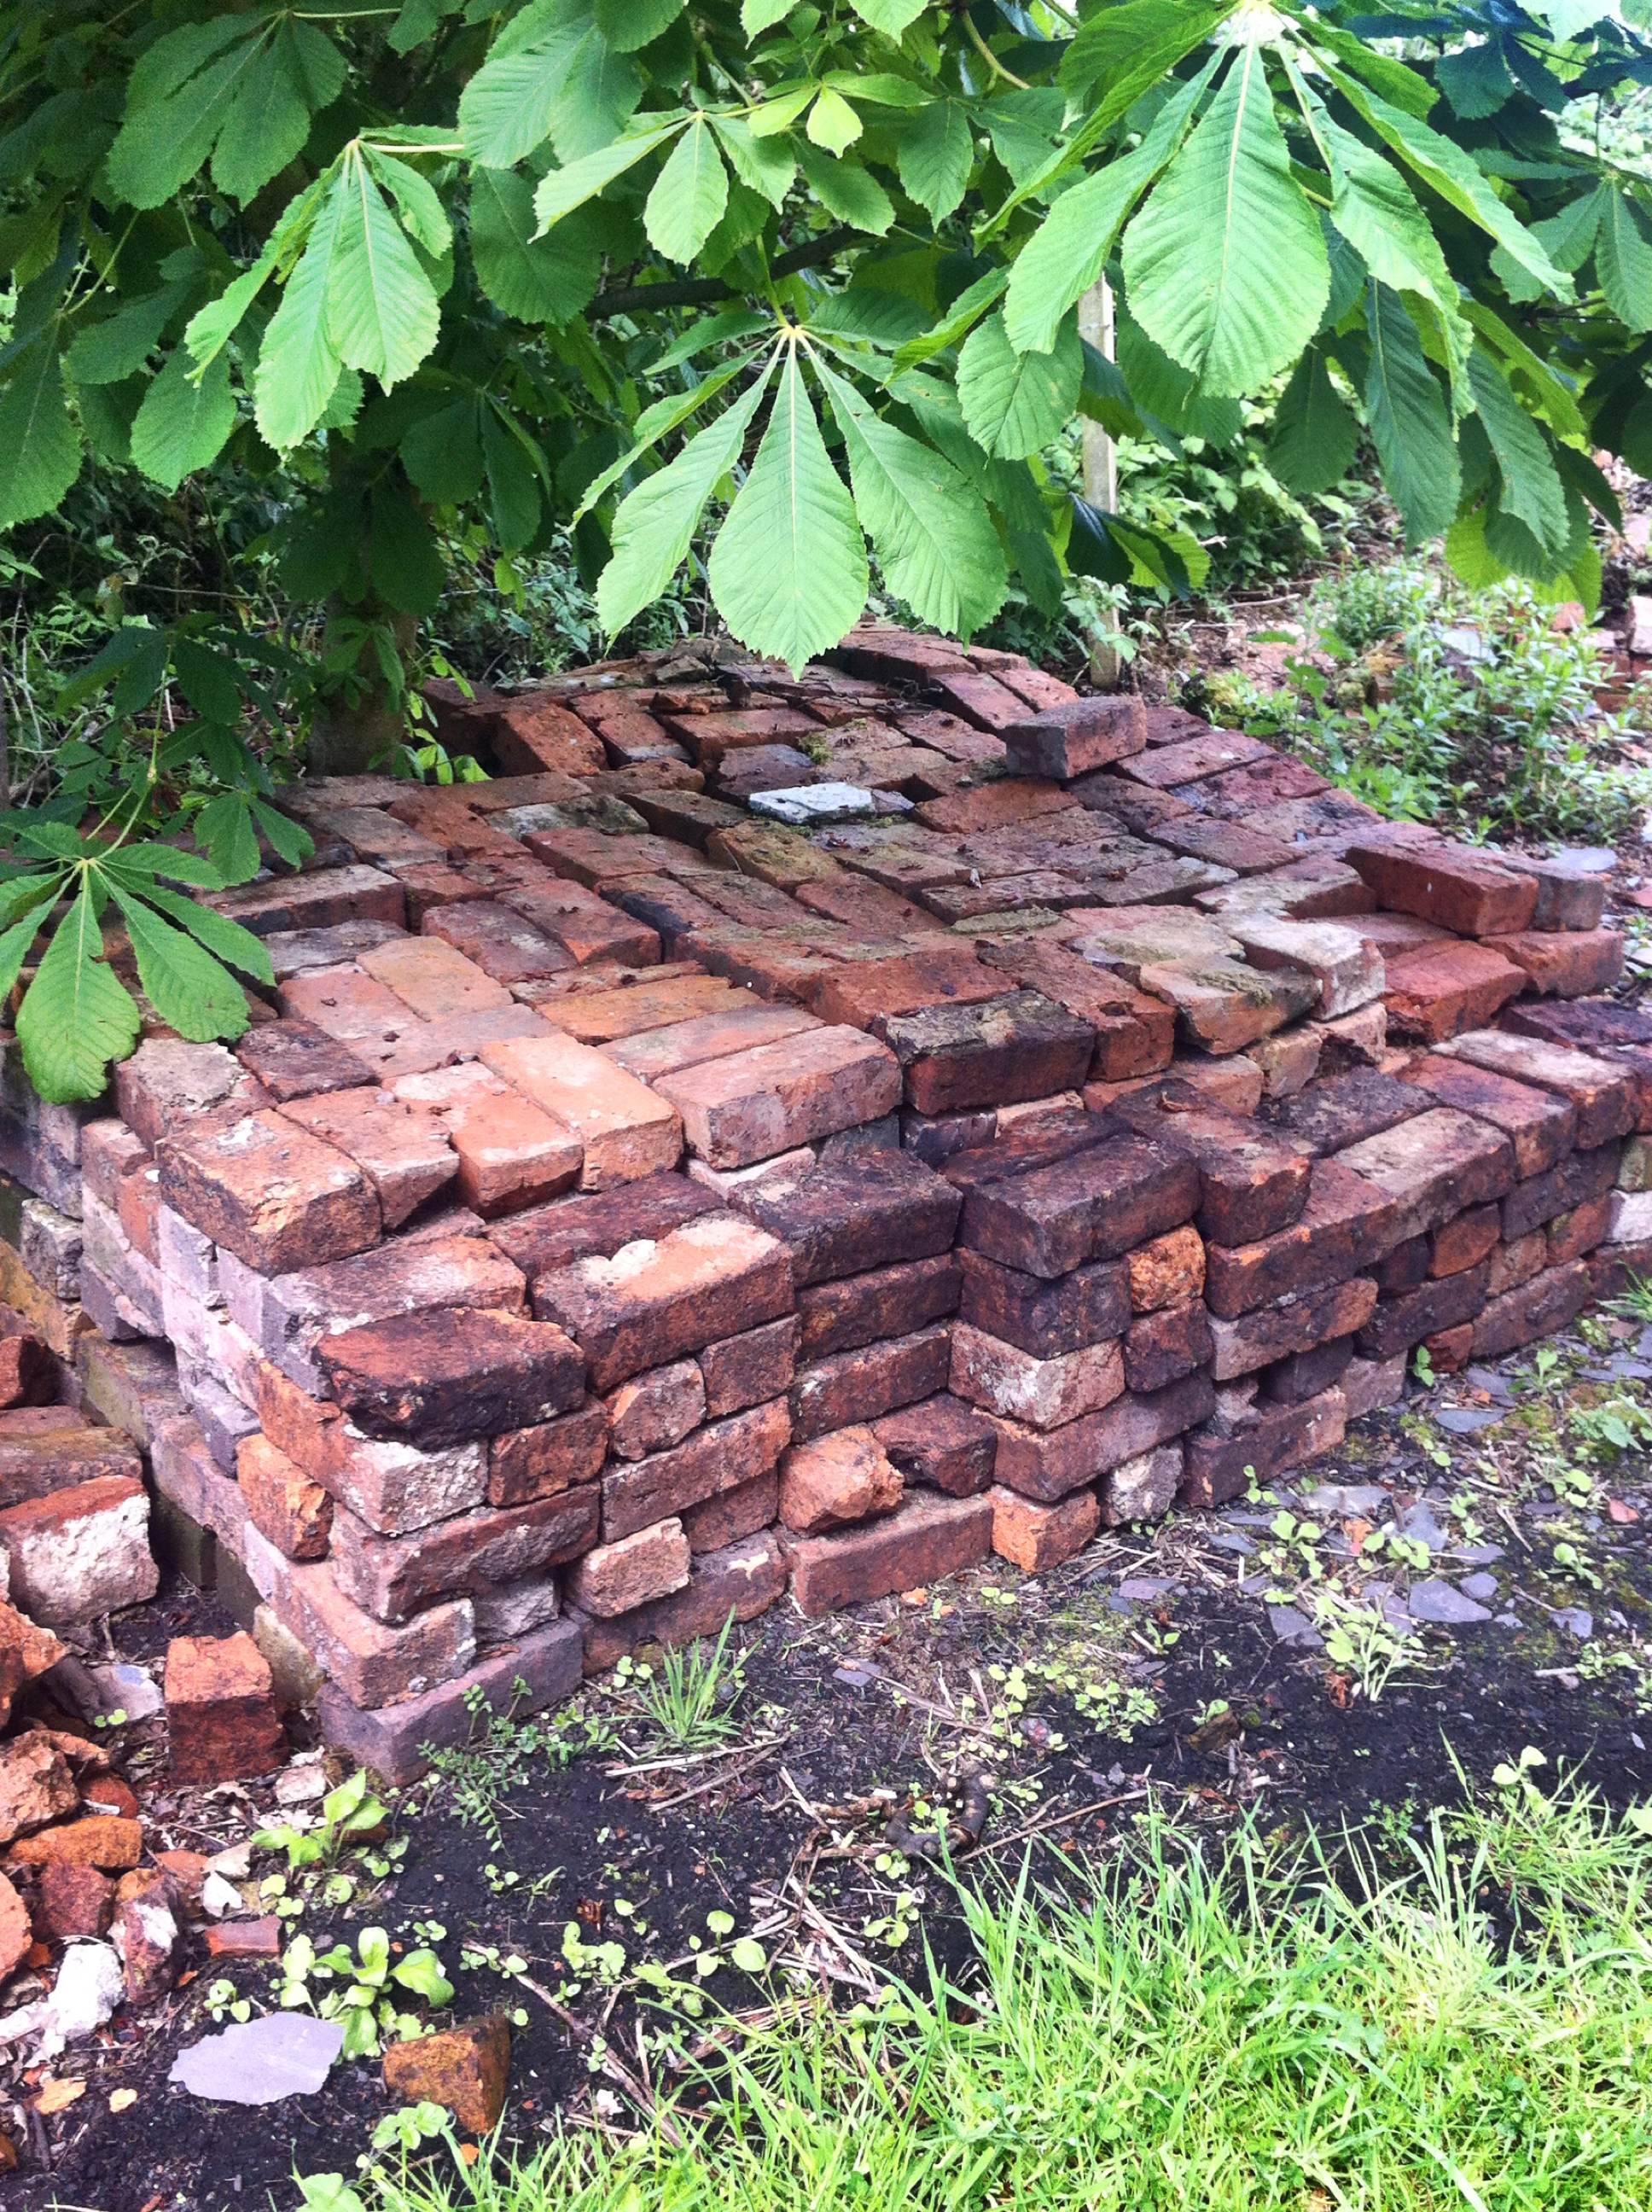 A pile of bricks represented as a memorial by artist Paul Conneally 2017